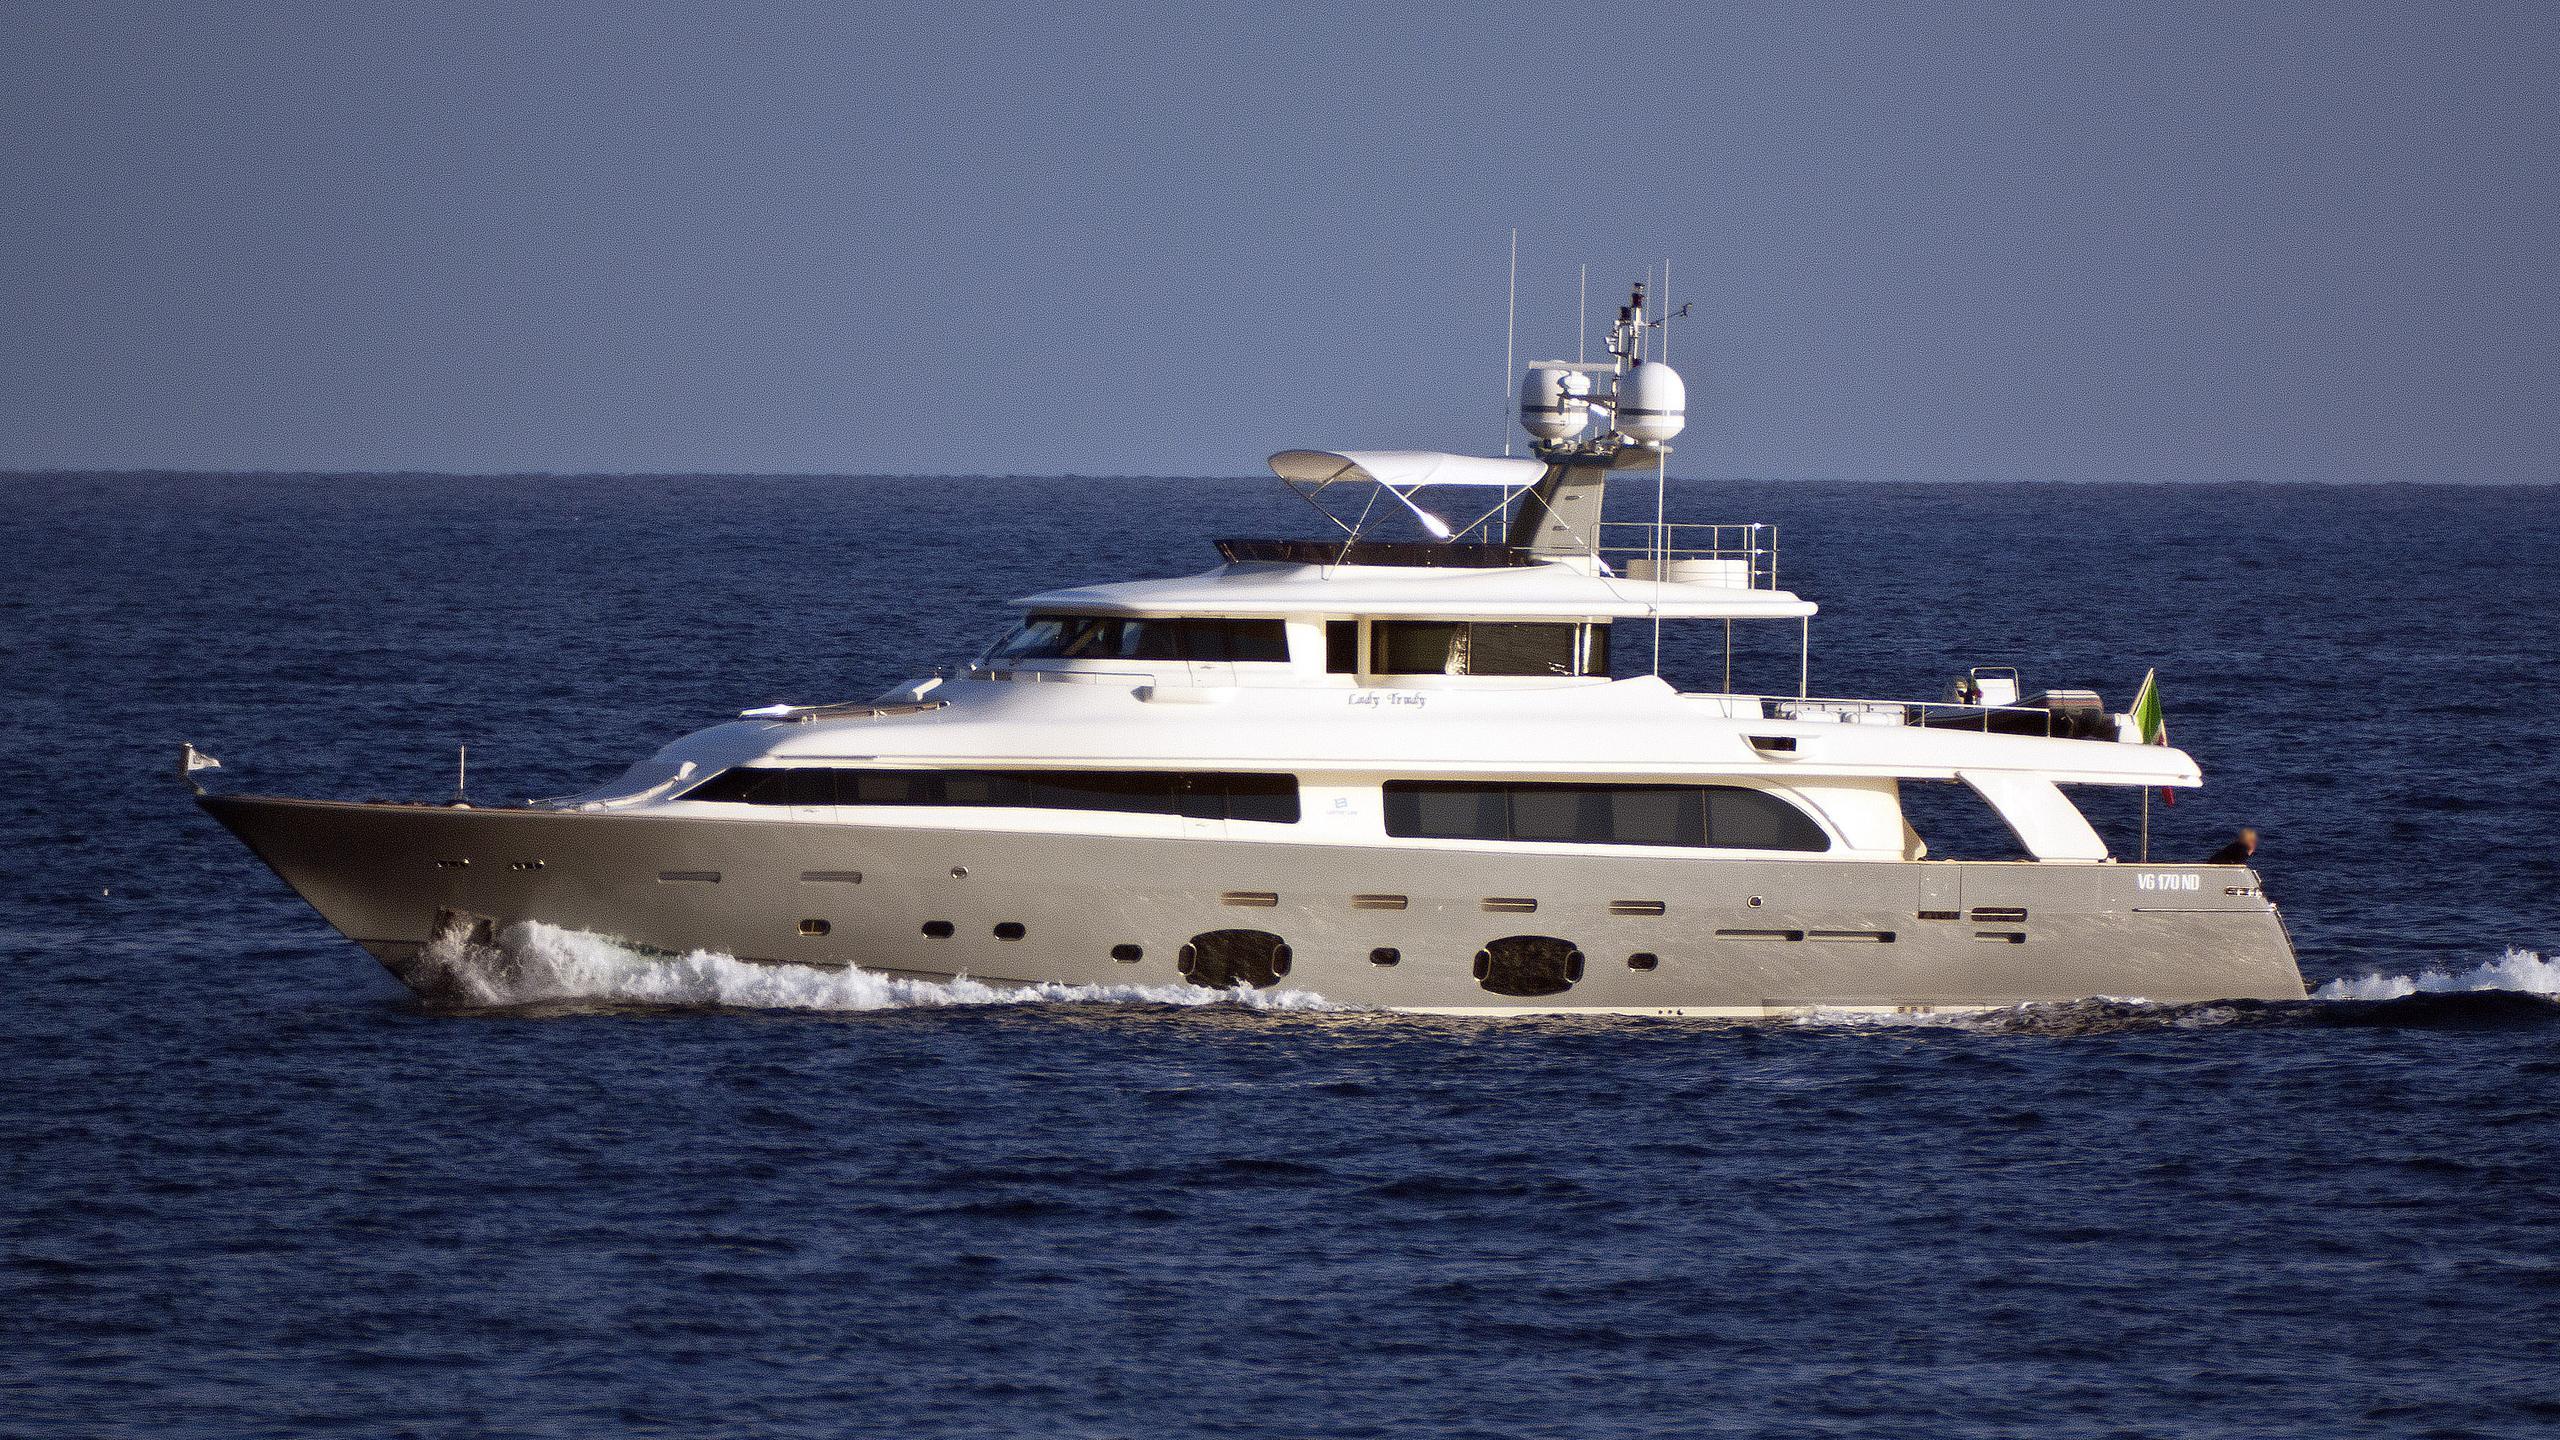 seventh-sense-motor-yacht-ferretti-navetta-33-2008-33m-cruising